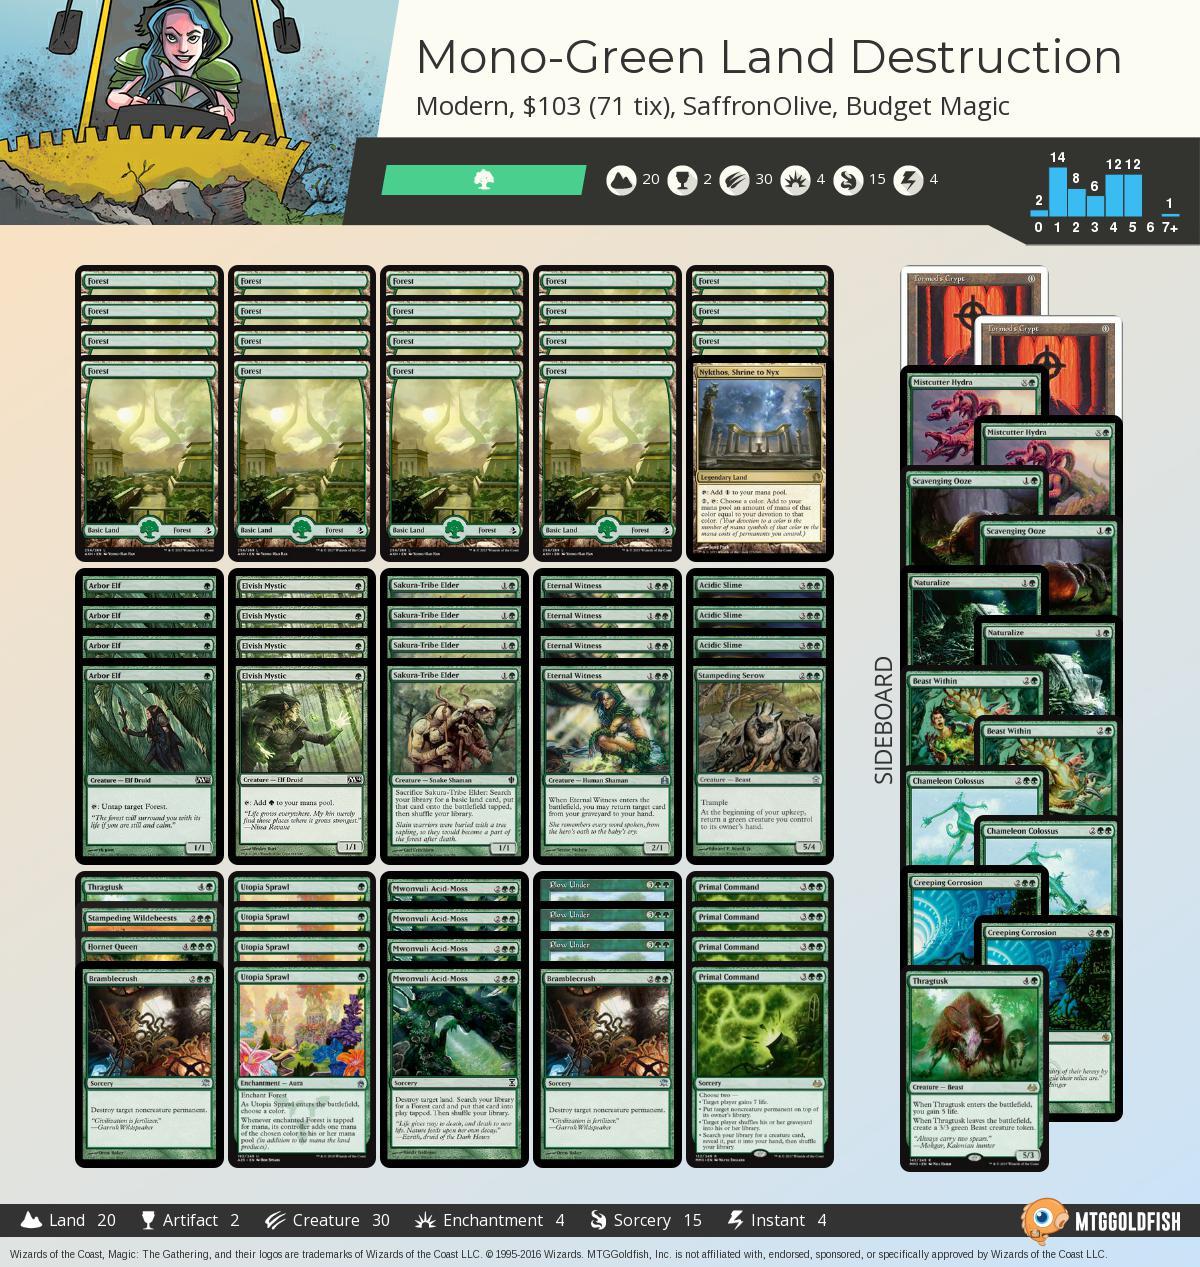 Mono green%2bland%2bdestruction a0fc91d4 4cd7 480a 846f ae0220255c18%2ejpg